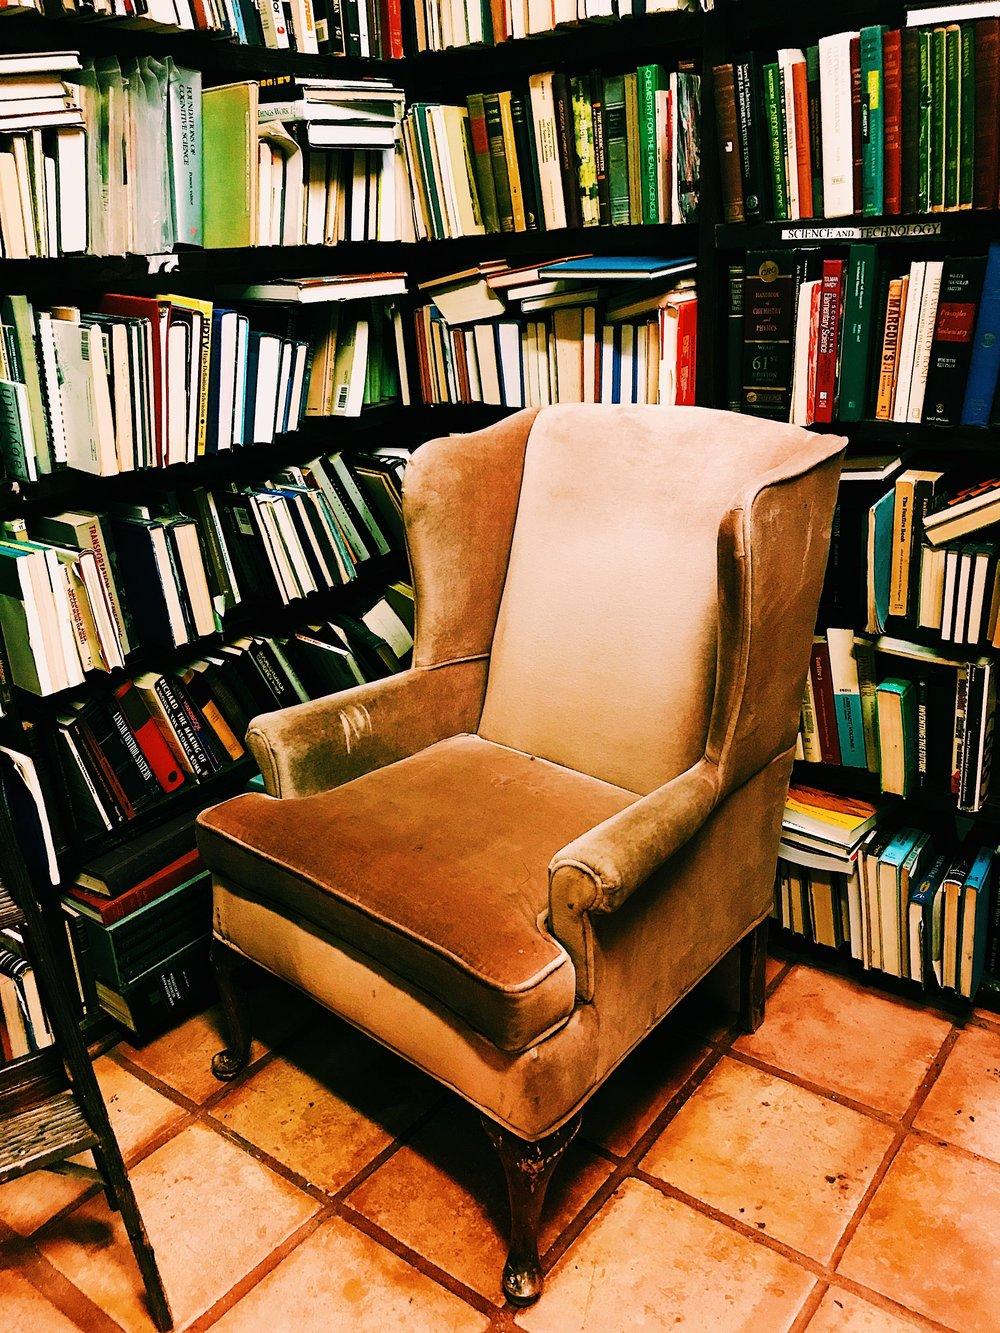 Three Heel Clicks - Houston Hotspots - Becker's Books (16).jpg